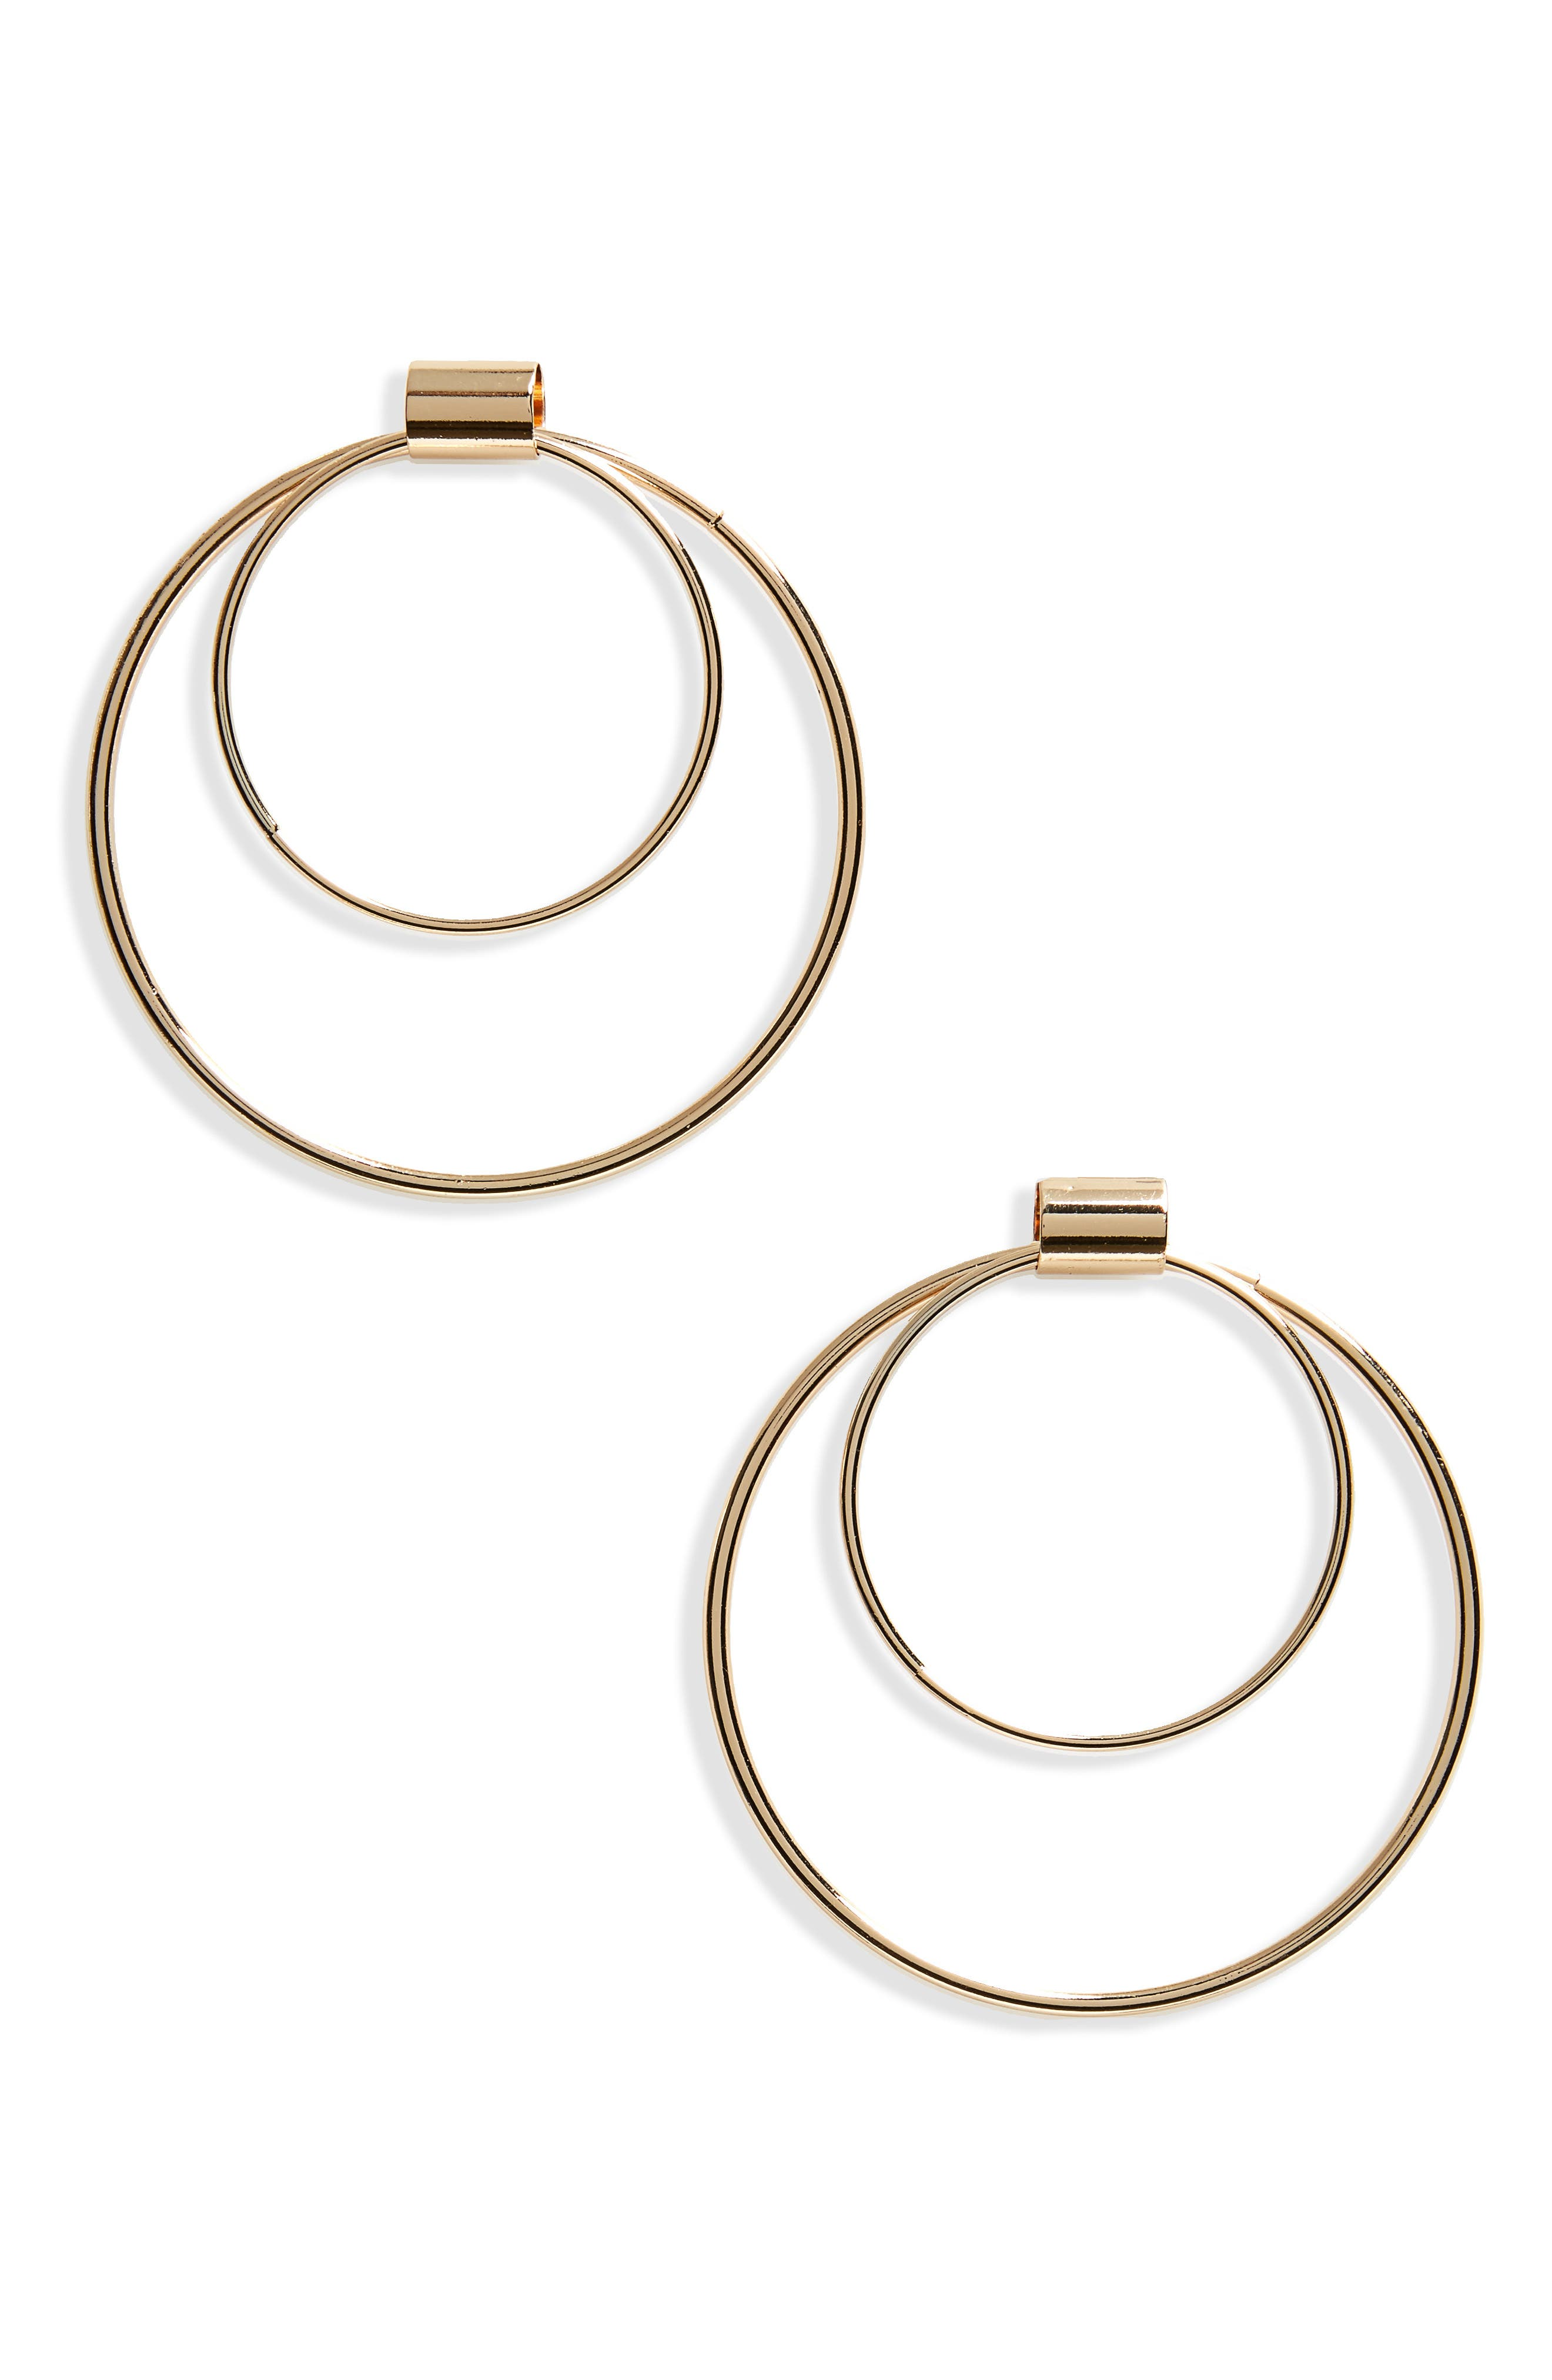 Double Hoop Earrings,                         Main,                         color, Gold